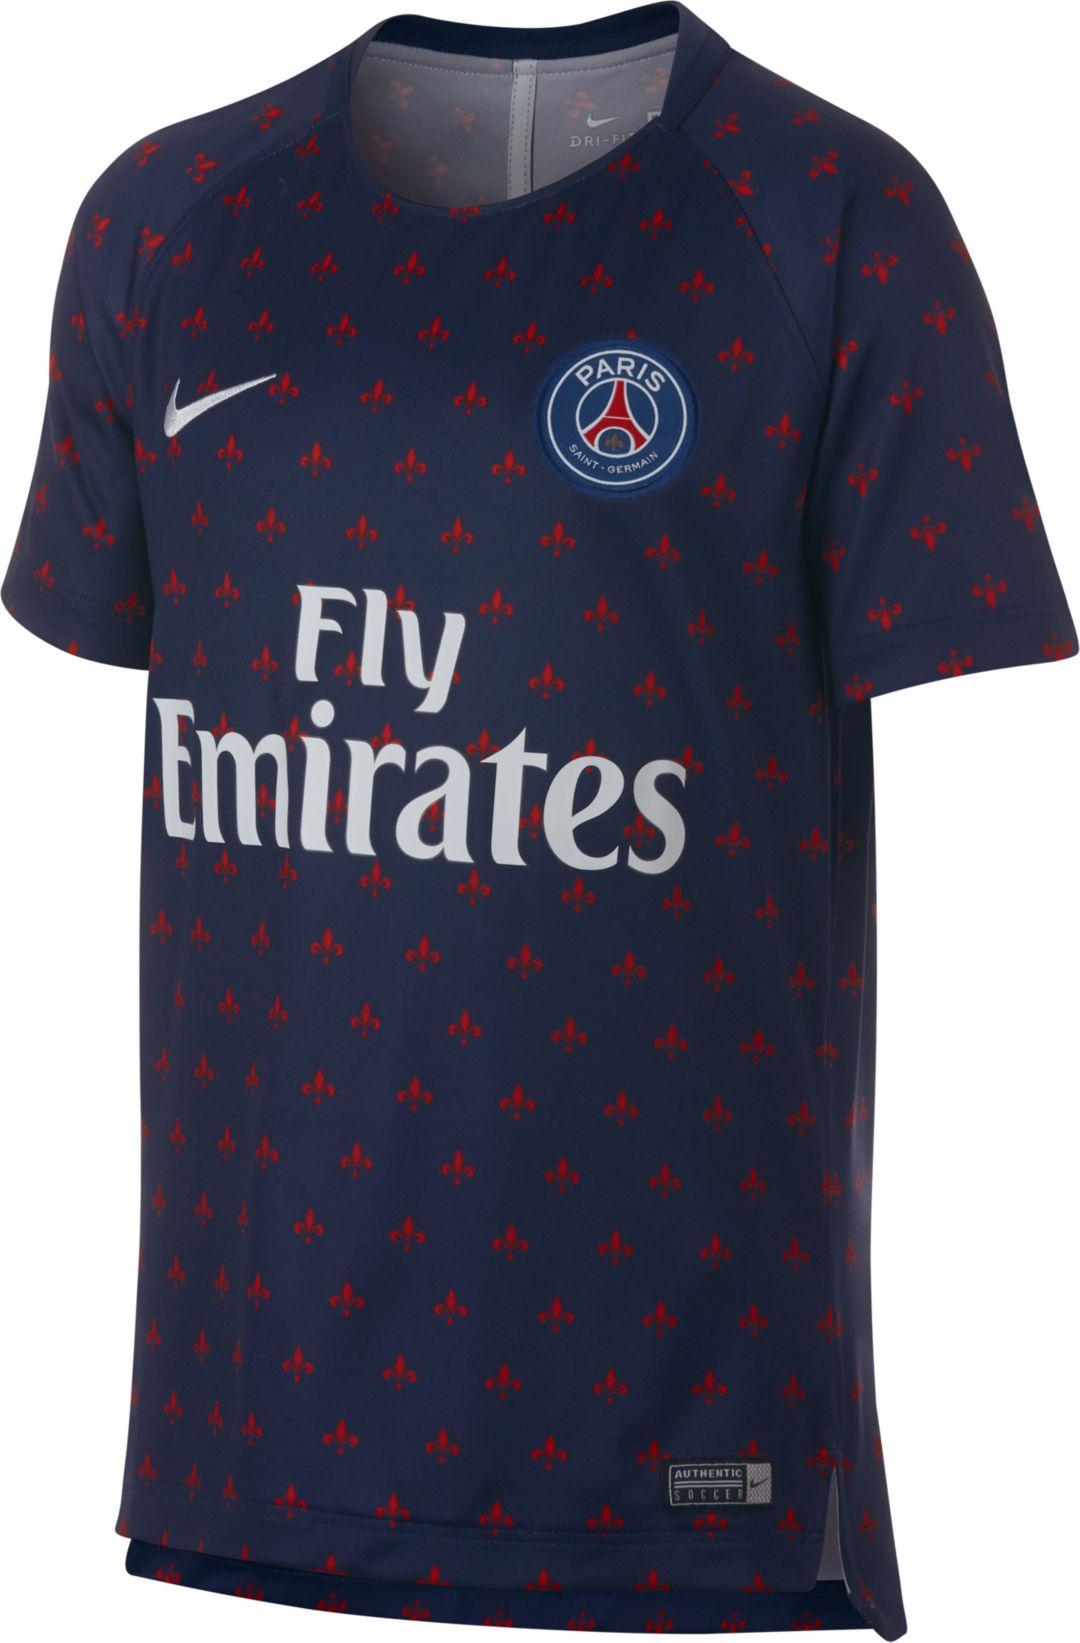 d7c11561d Nike Youth Paris Saint-Germain Navy Prematch Top | DICK'S Sporting Goods